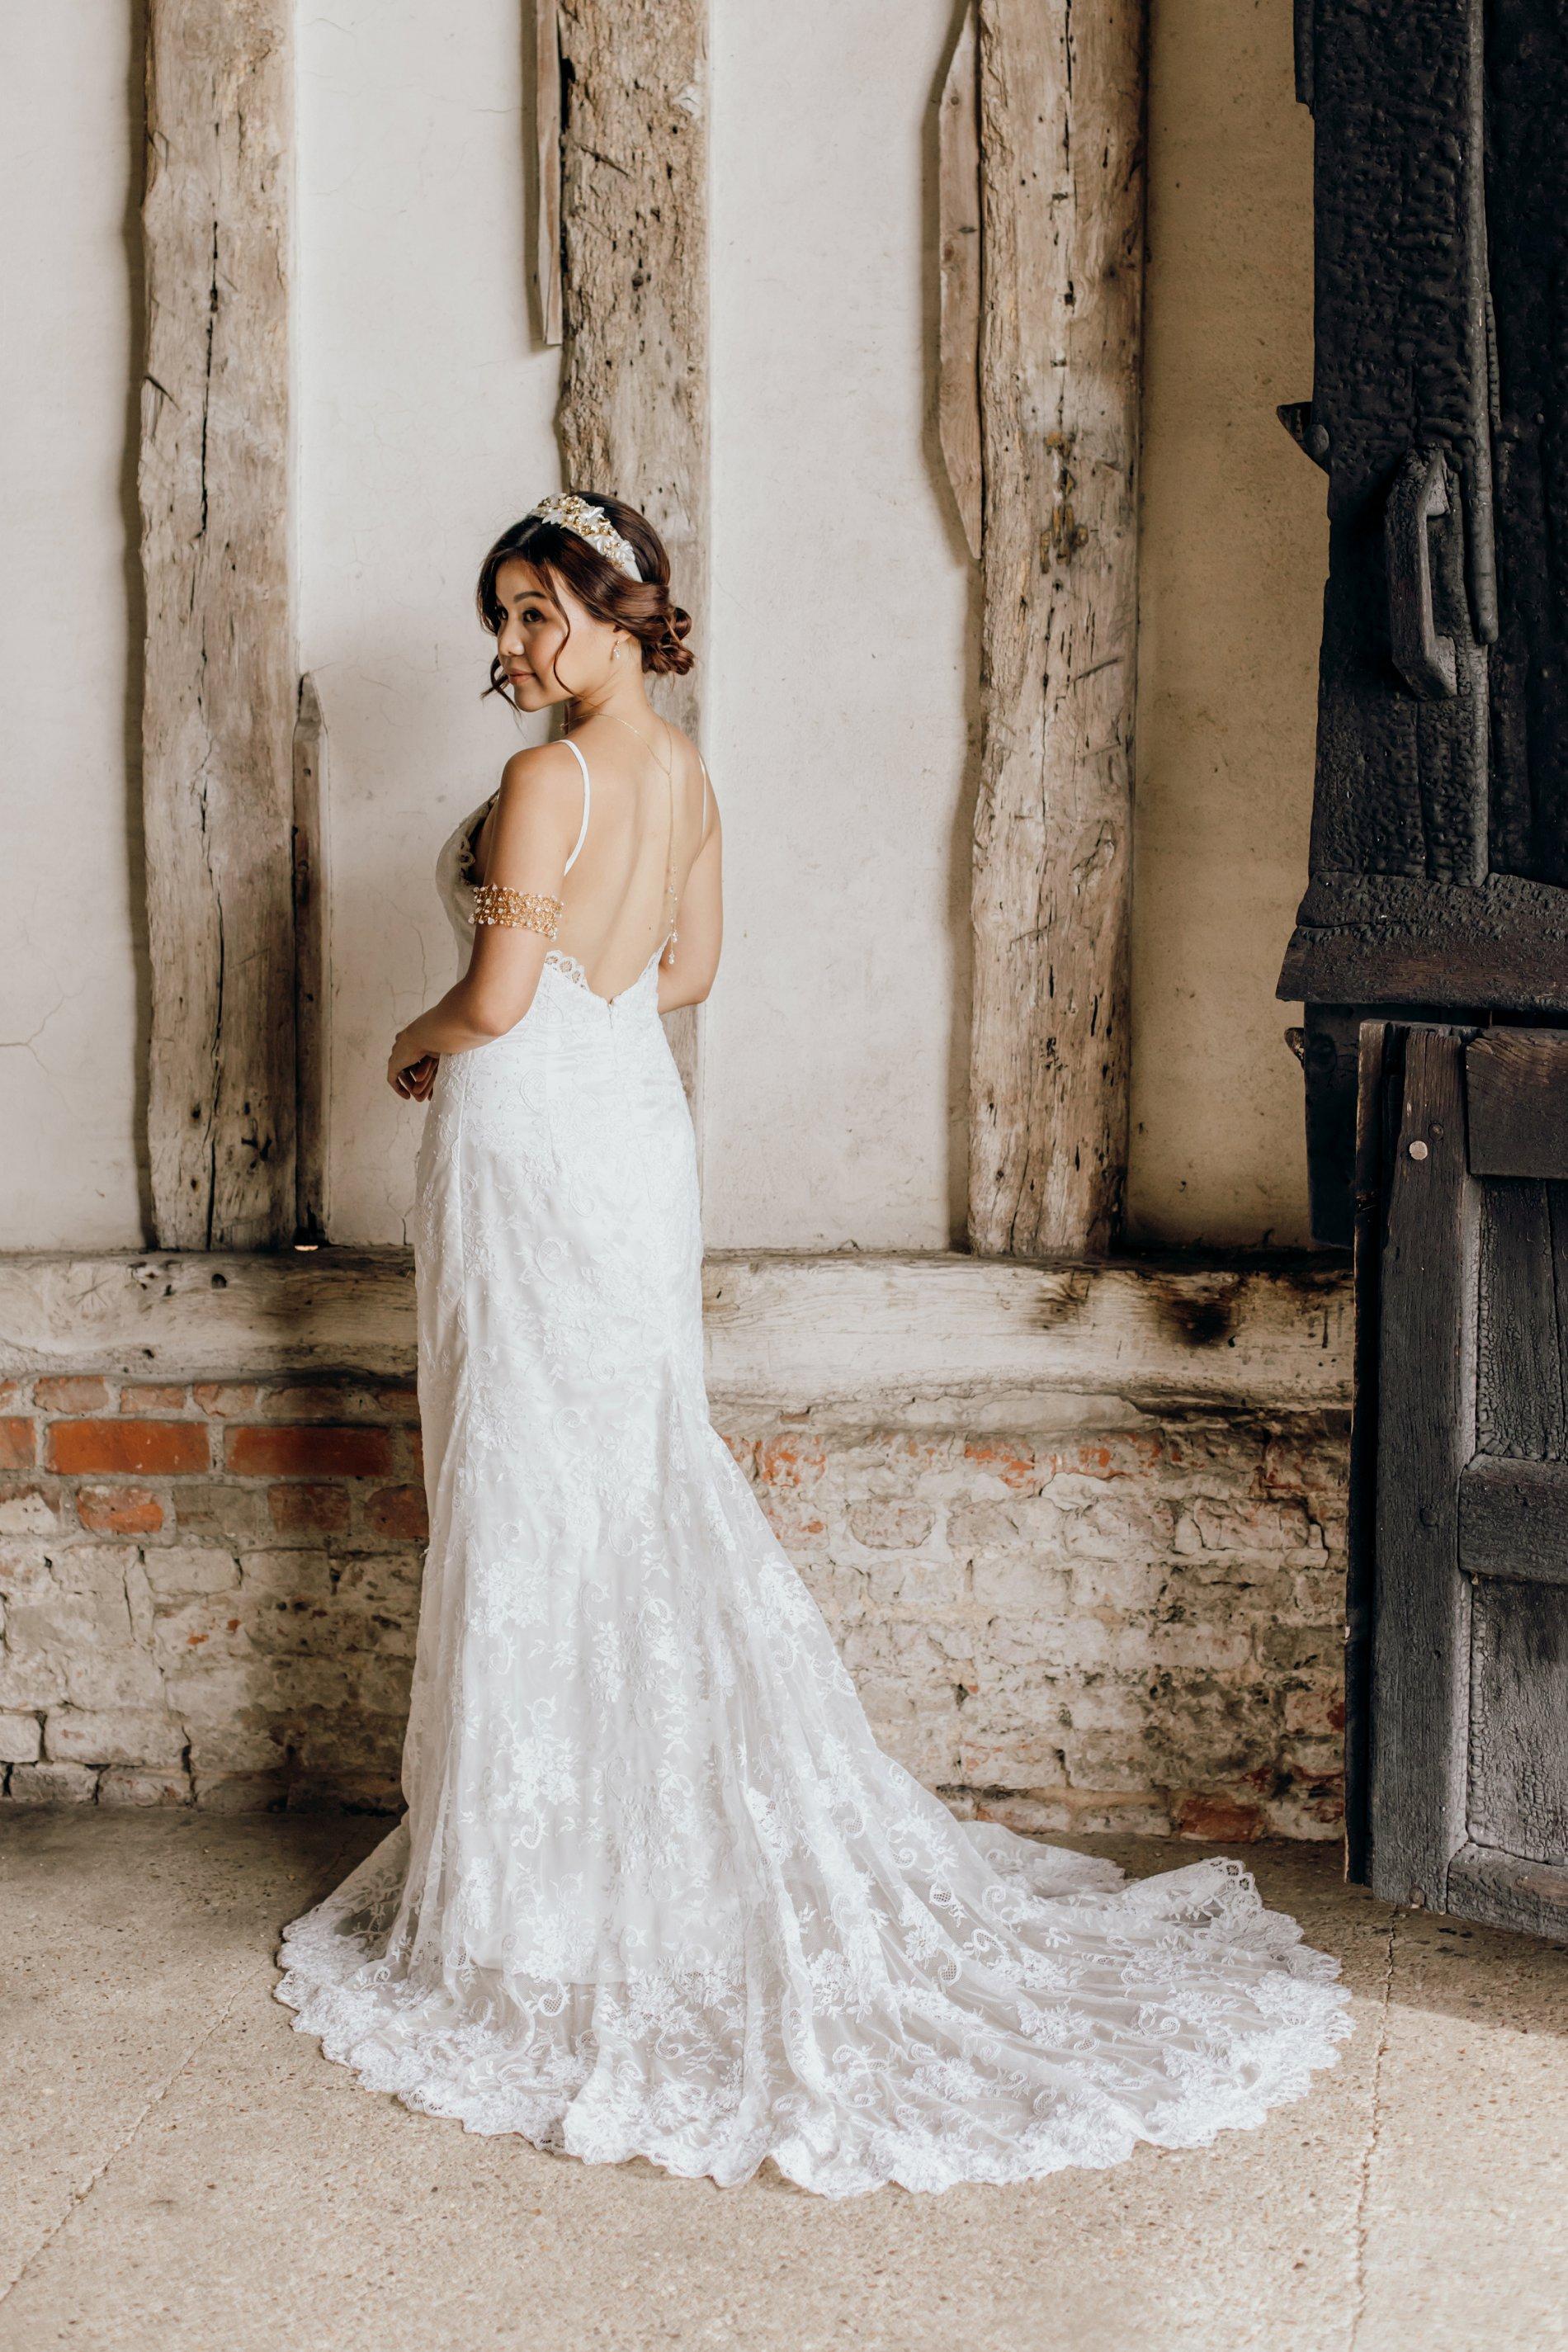 A Golden Boho Wedding Shoot at Cressing Temple Barns (c) Kate Boston Photography (7)